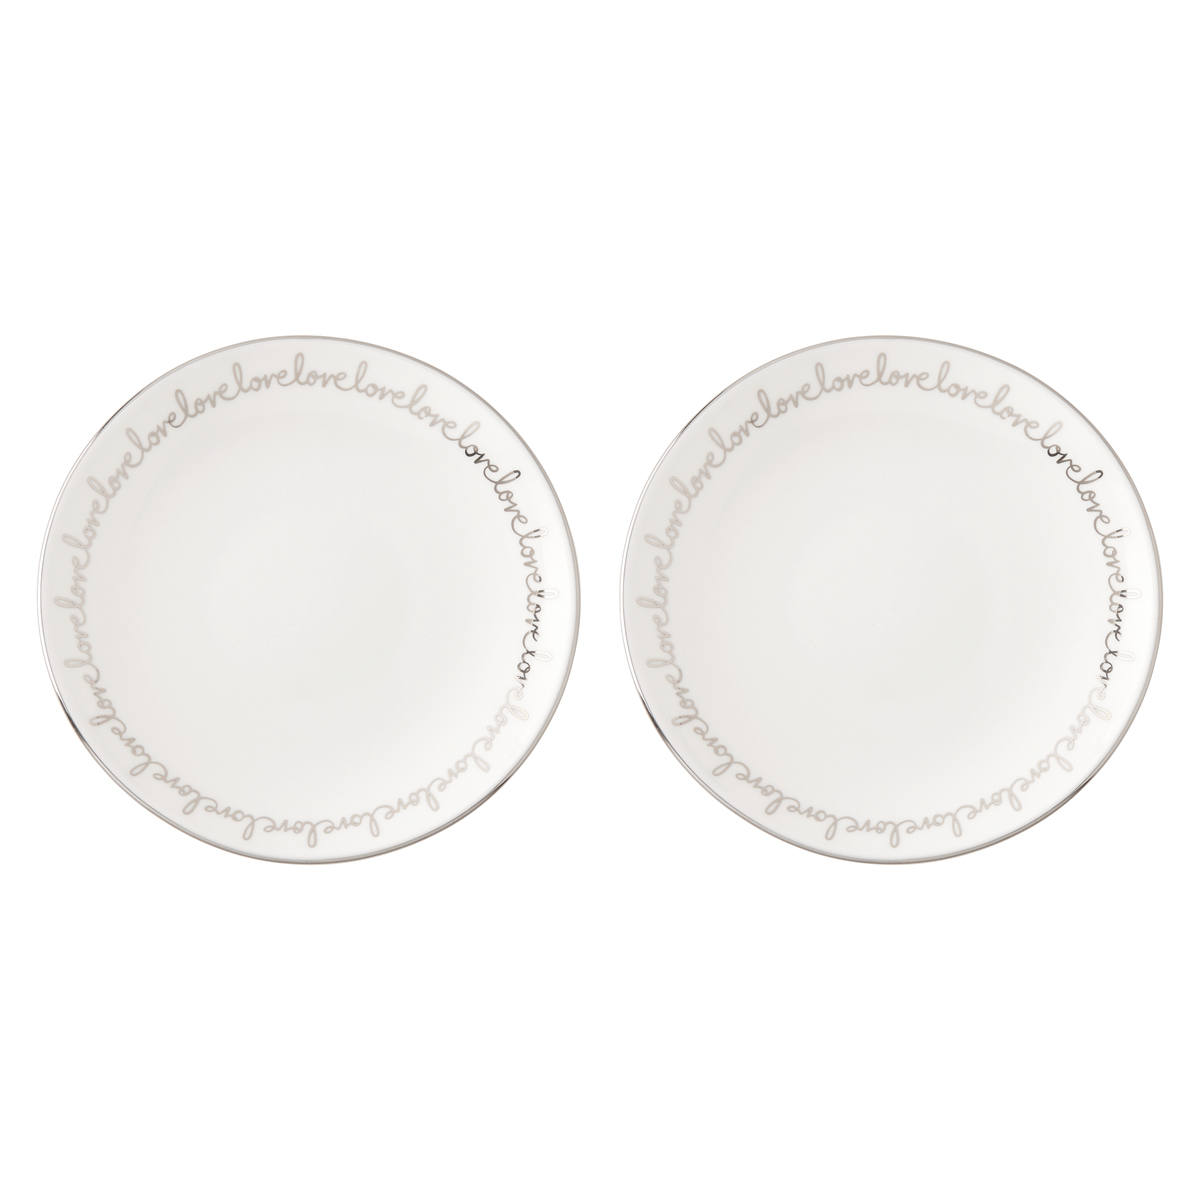 Kate Spade China by Lenox, Key Court Porcelain Love Tidbits, Set of 2